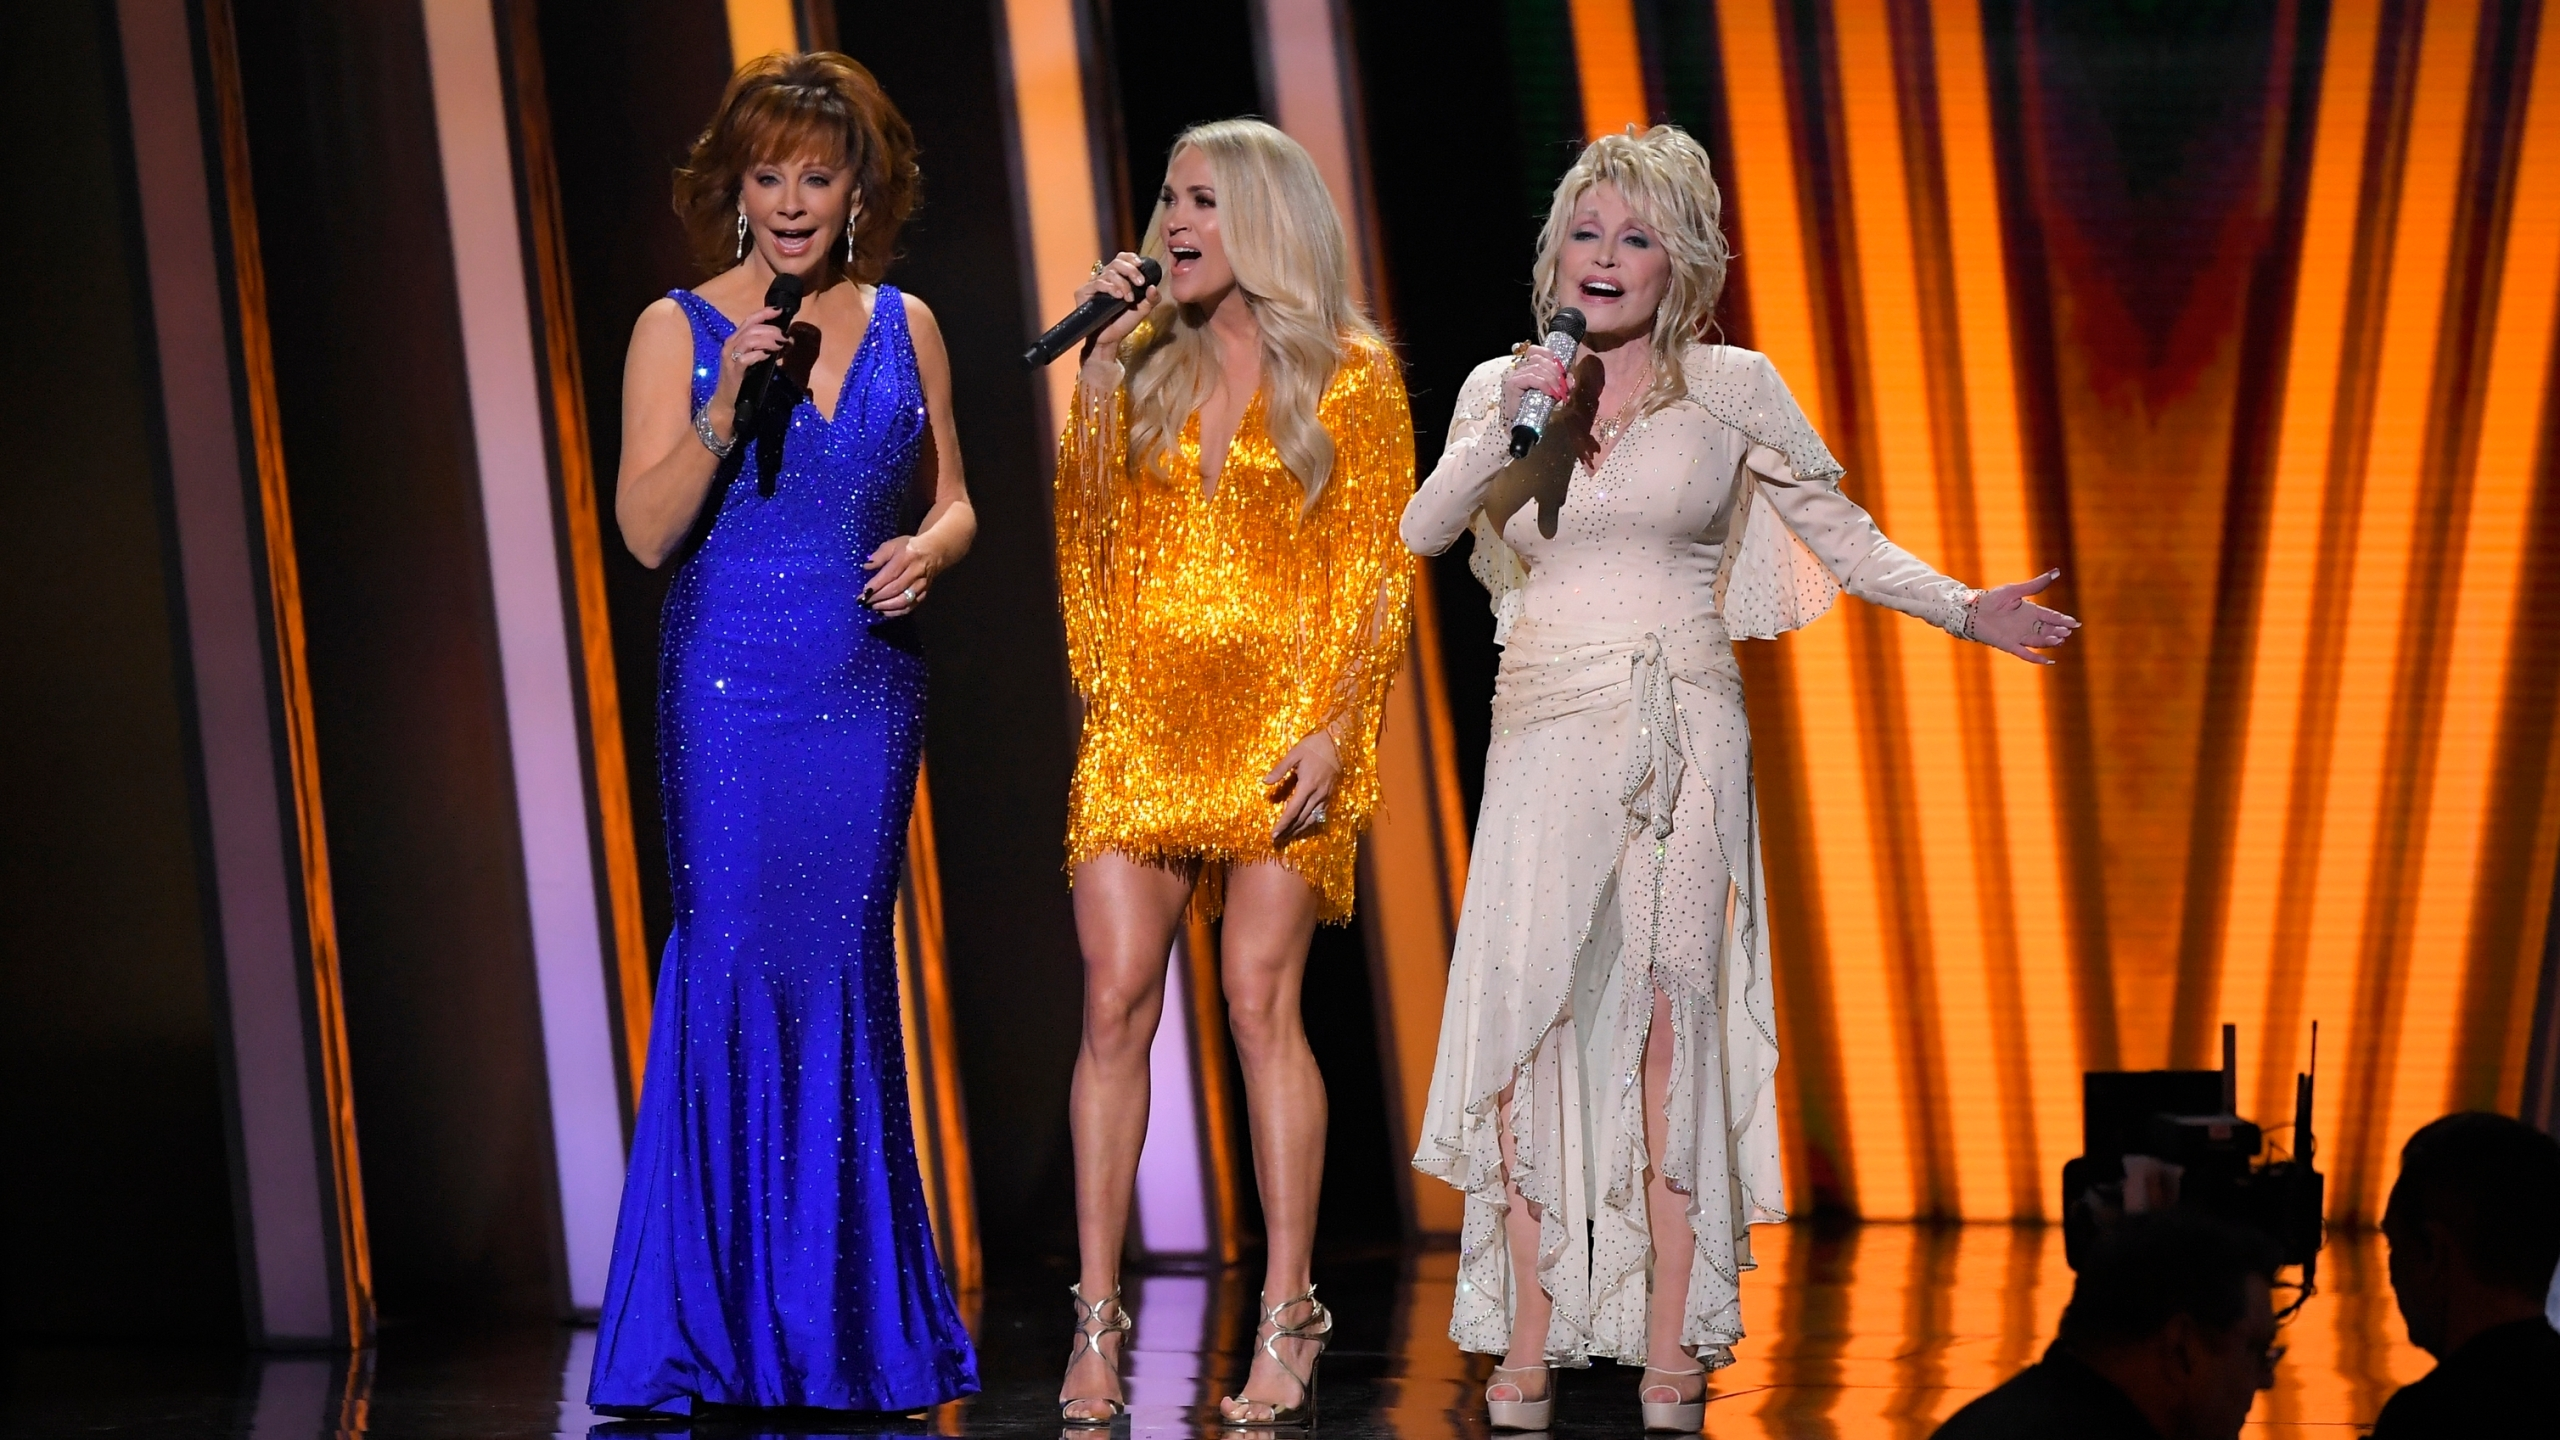 Reba McEntire, Carrie Underwood, Dolly Parton